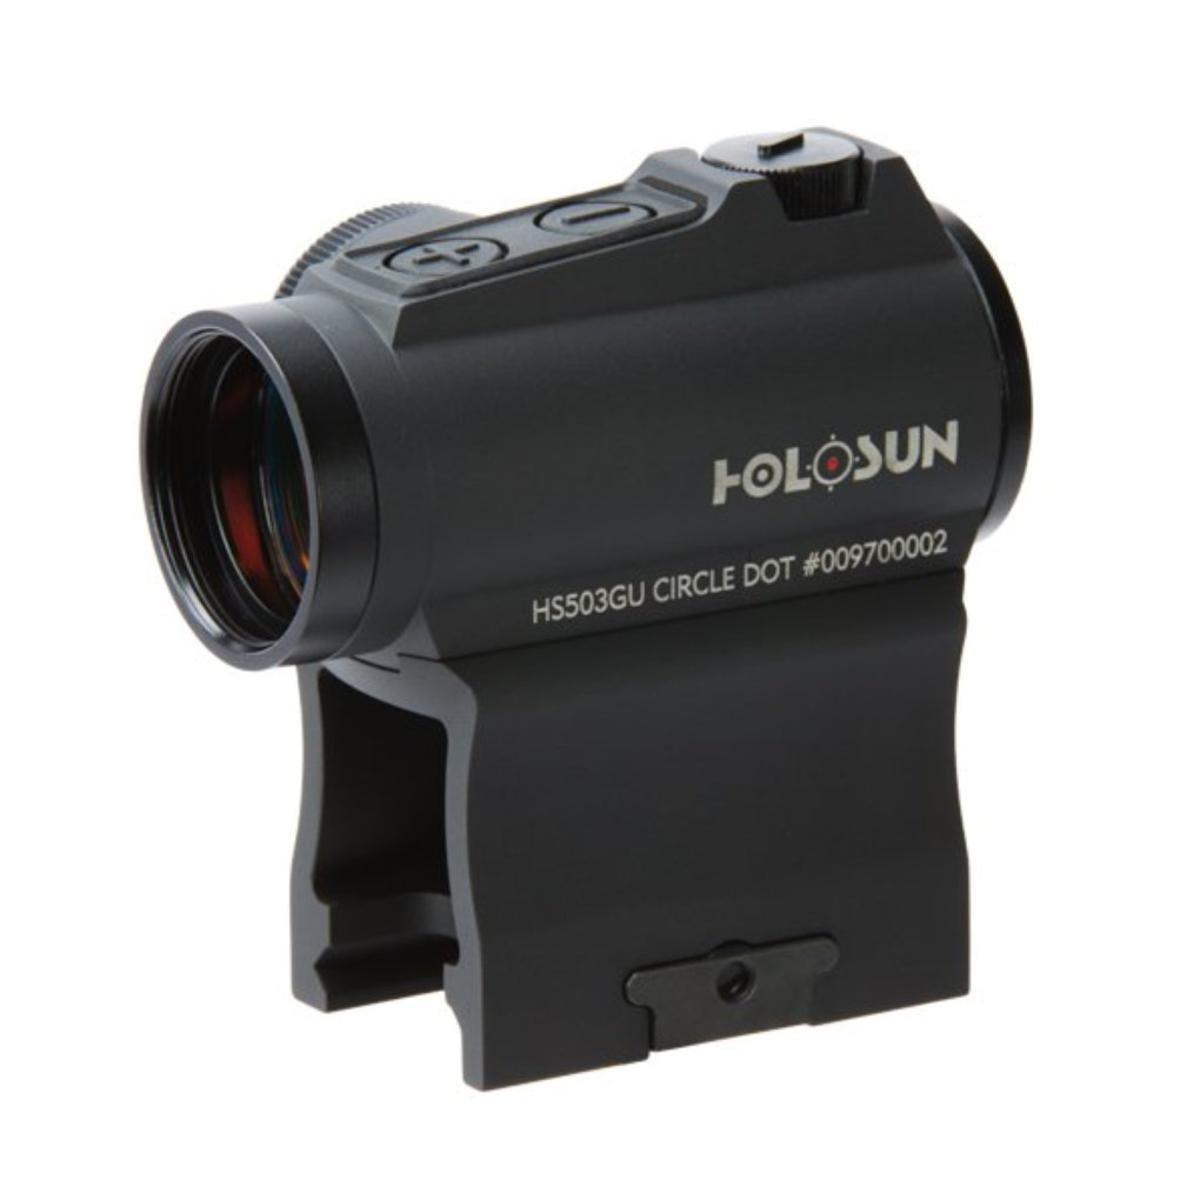 HOLOSUN HS503GU Circle Micro Red Dot Sight, 2 MOA Dot, 65 MOA Circle, Black by HOLOSUN